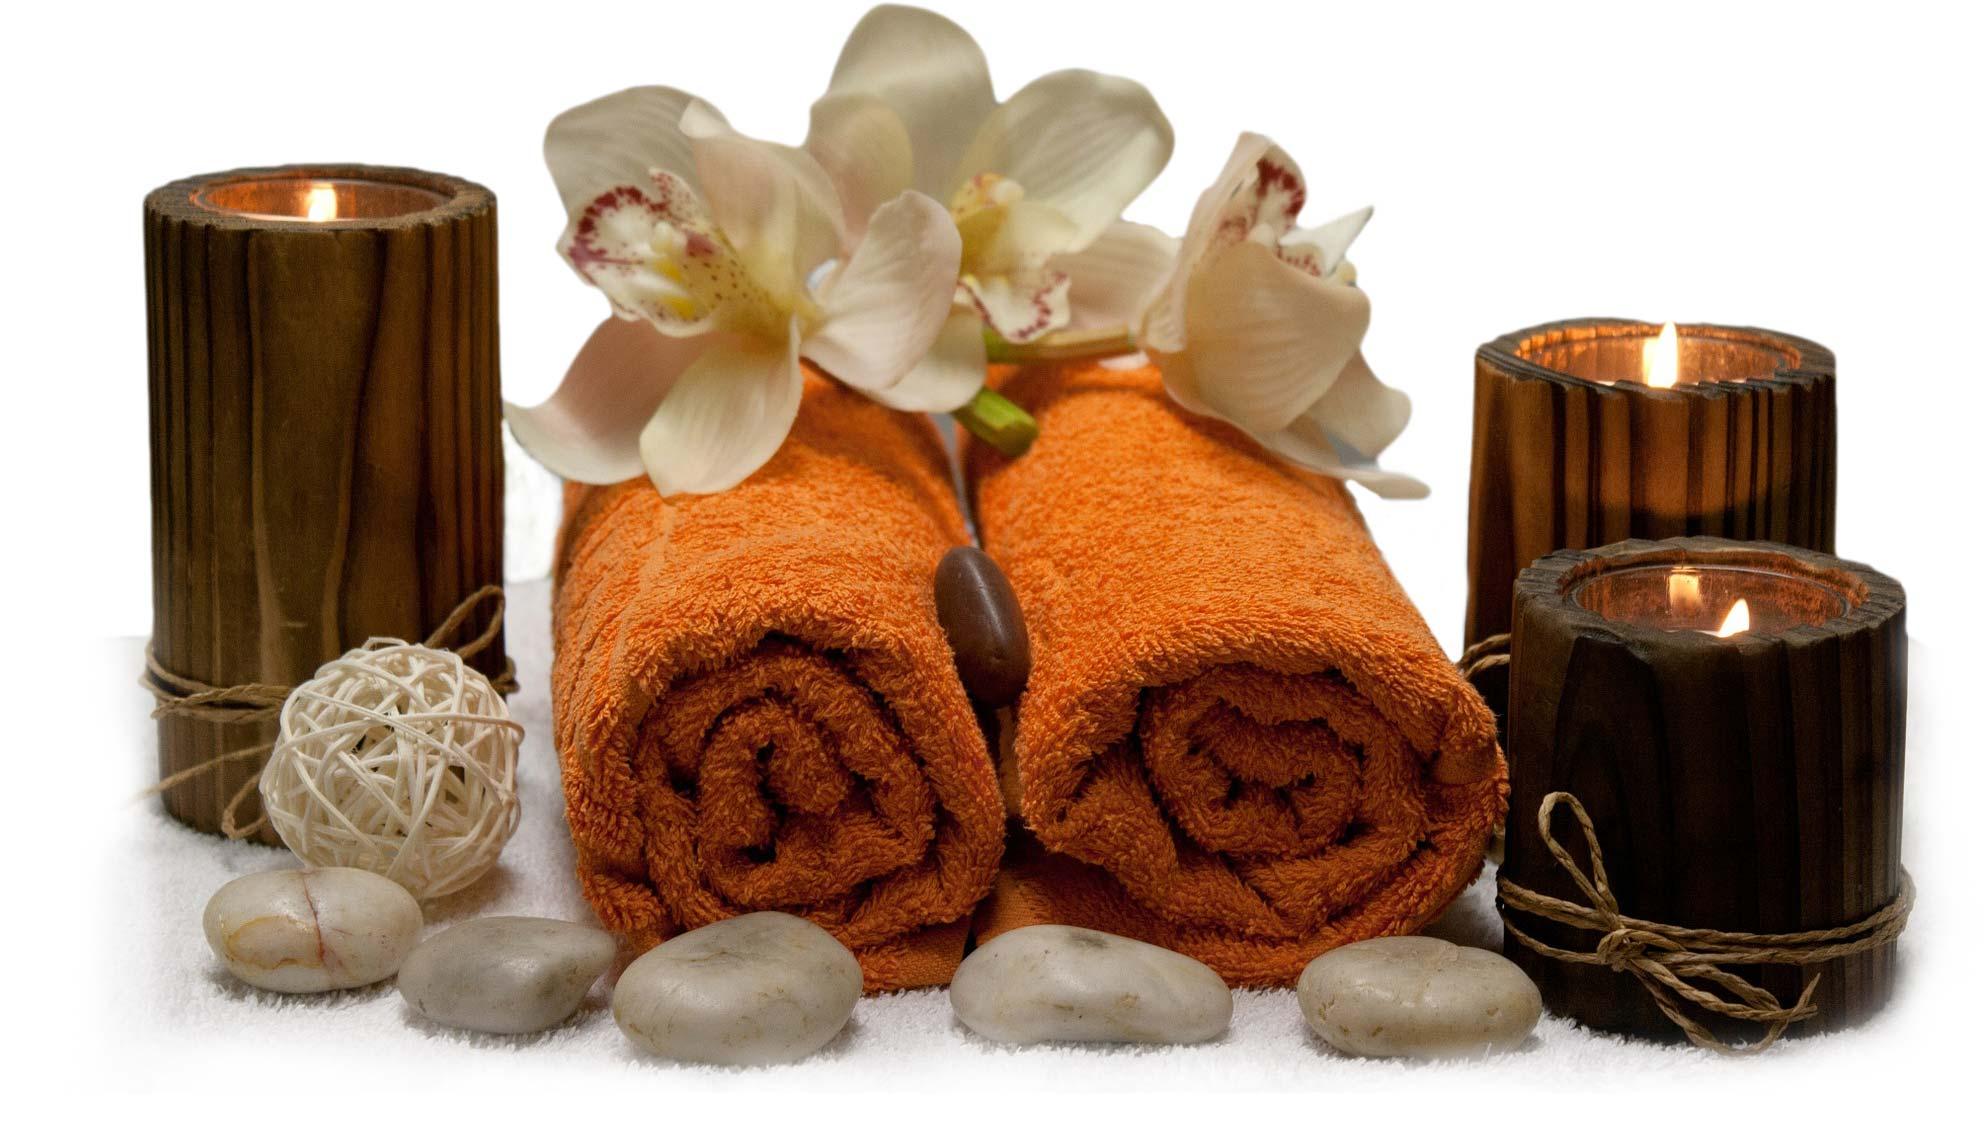 Spa - Beauty & Health